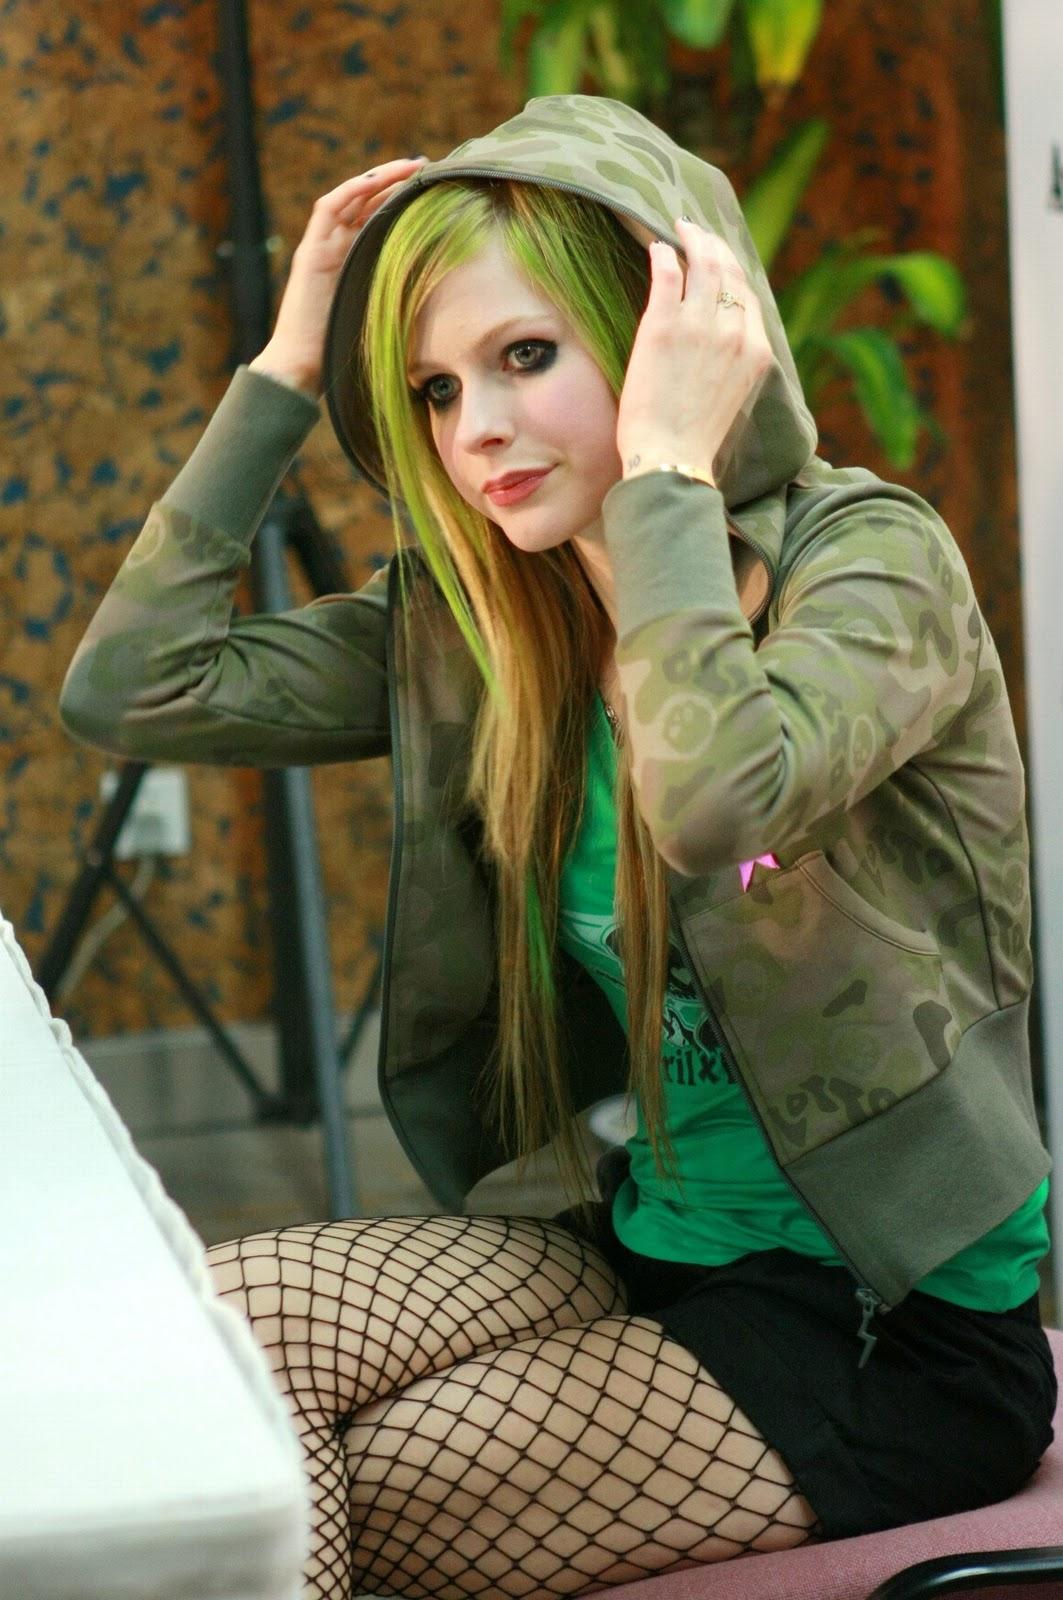 Avril lavigne goodbye - 1 part 9